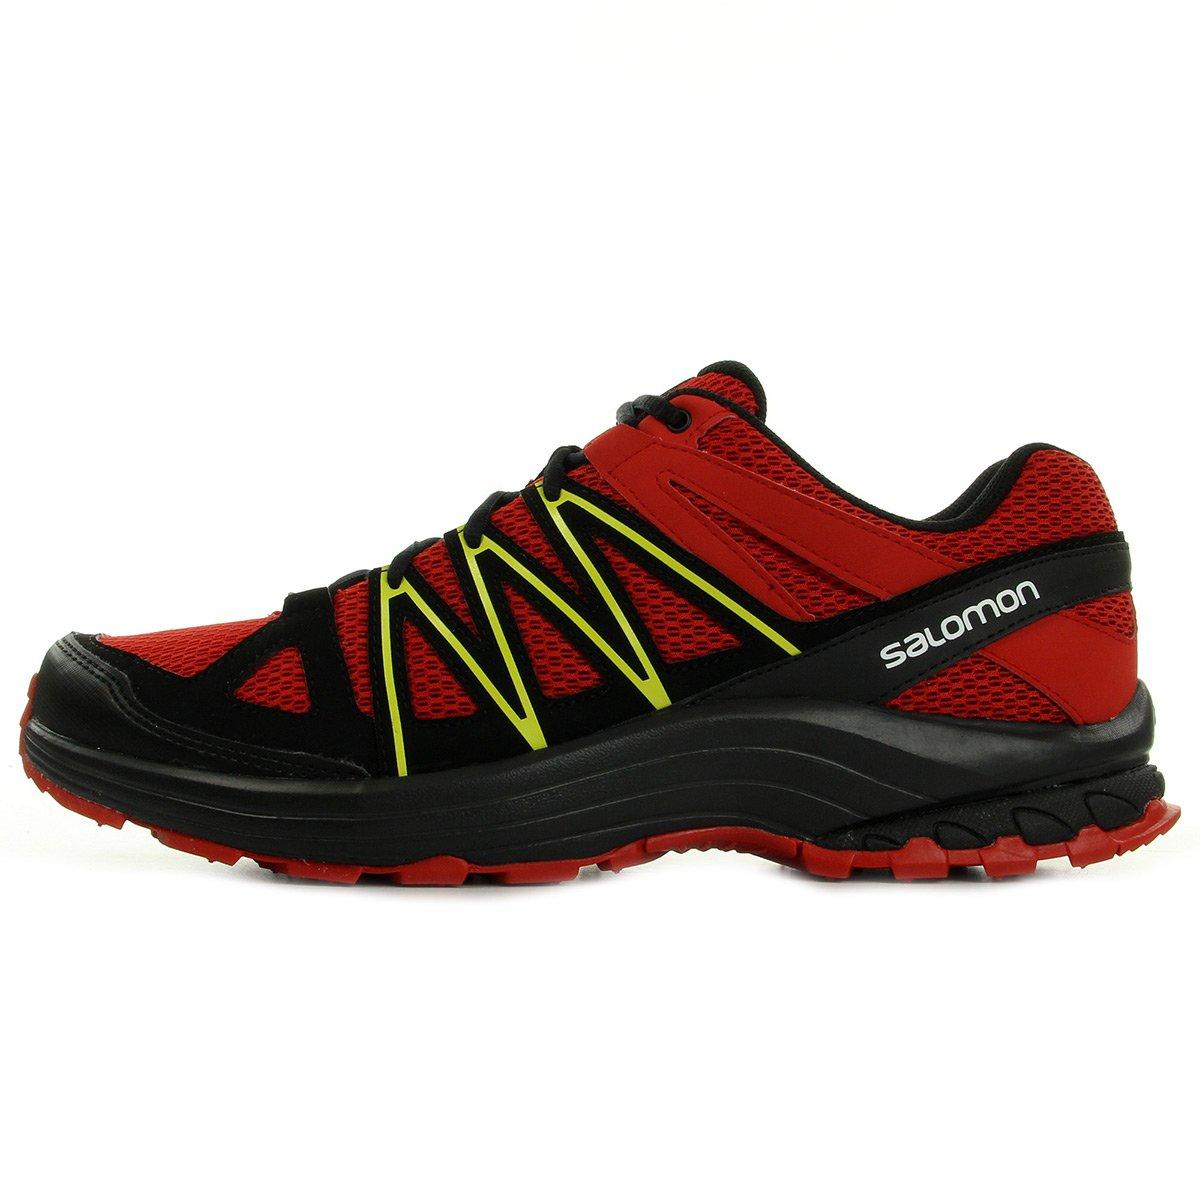 Salomon Xa Bondcliff 390789, Running shoes 44 23 EU